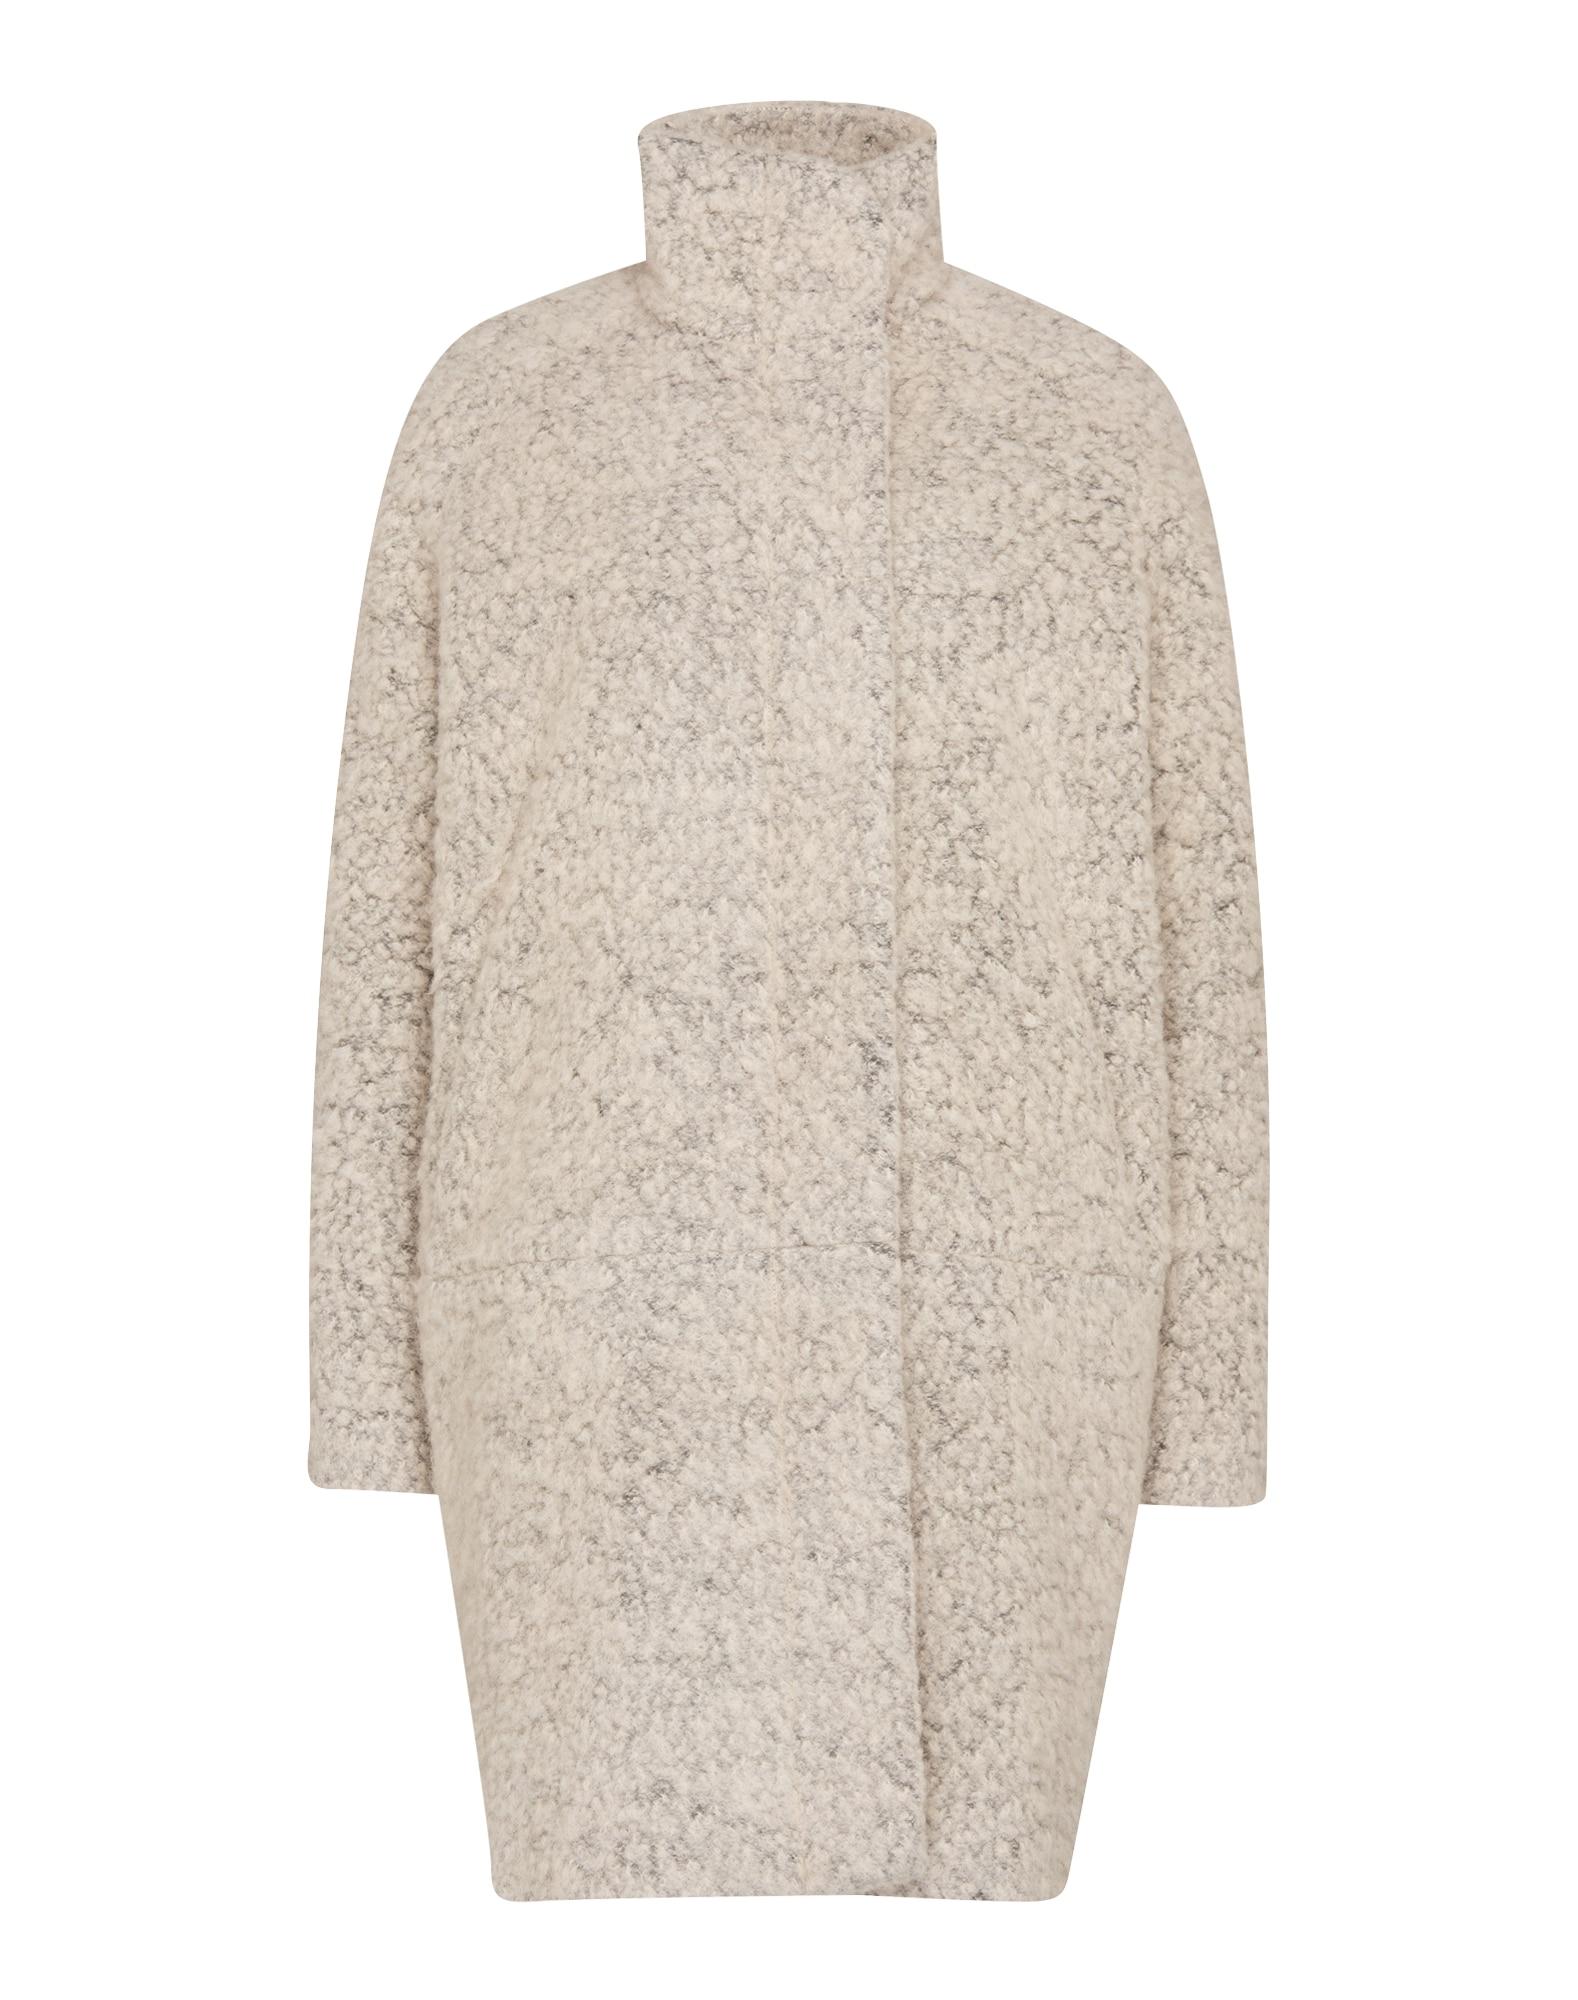 Zimní kabát Hoff 6182 šedý melír Samsoe & Samsoe